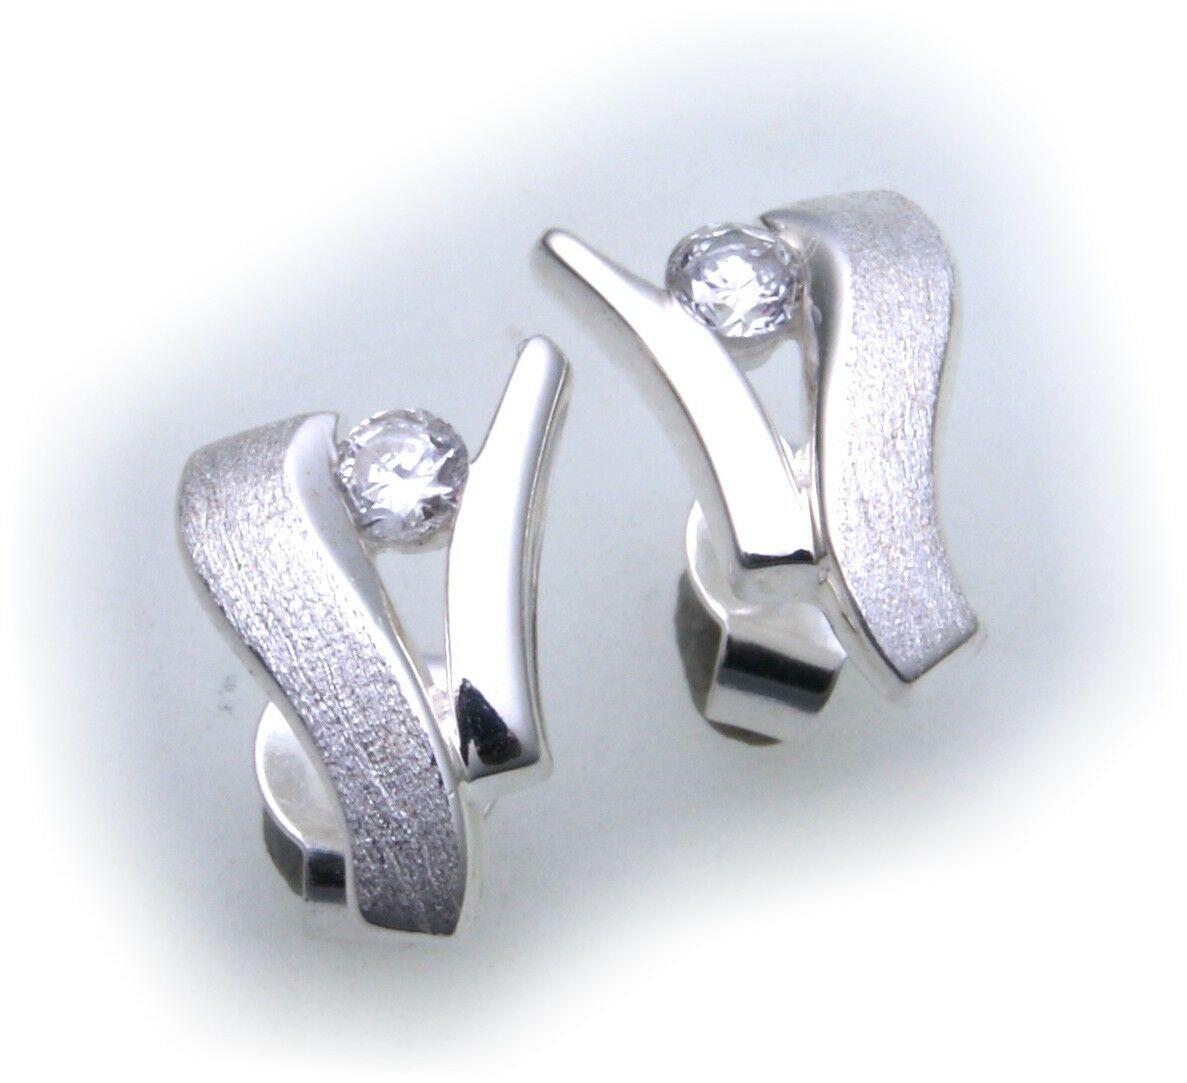 Damen Ohrringe Zirkonia Silber 925 Qualität Ohrstecker Sterlingsilber BR2649 ZI